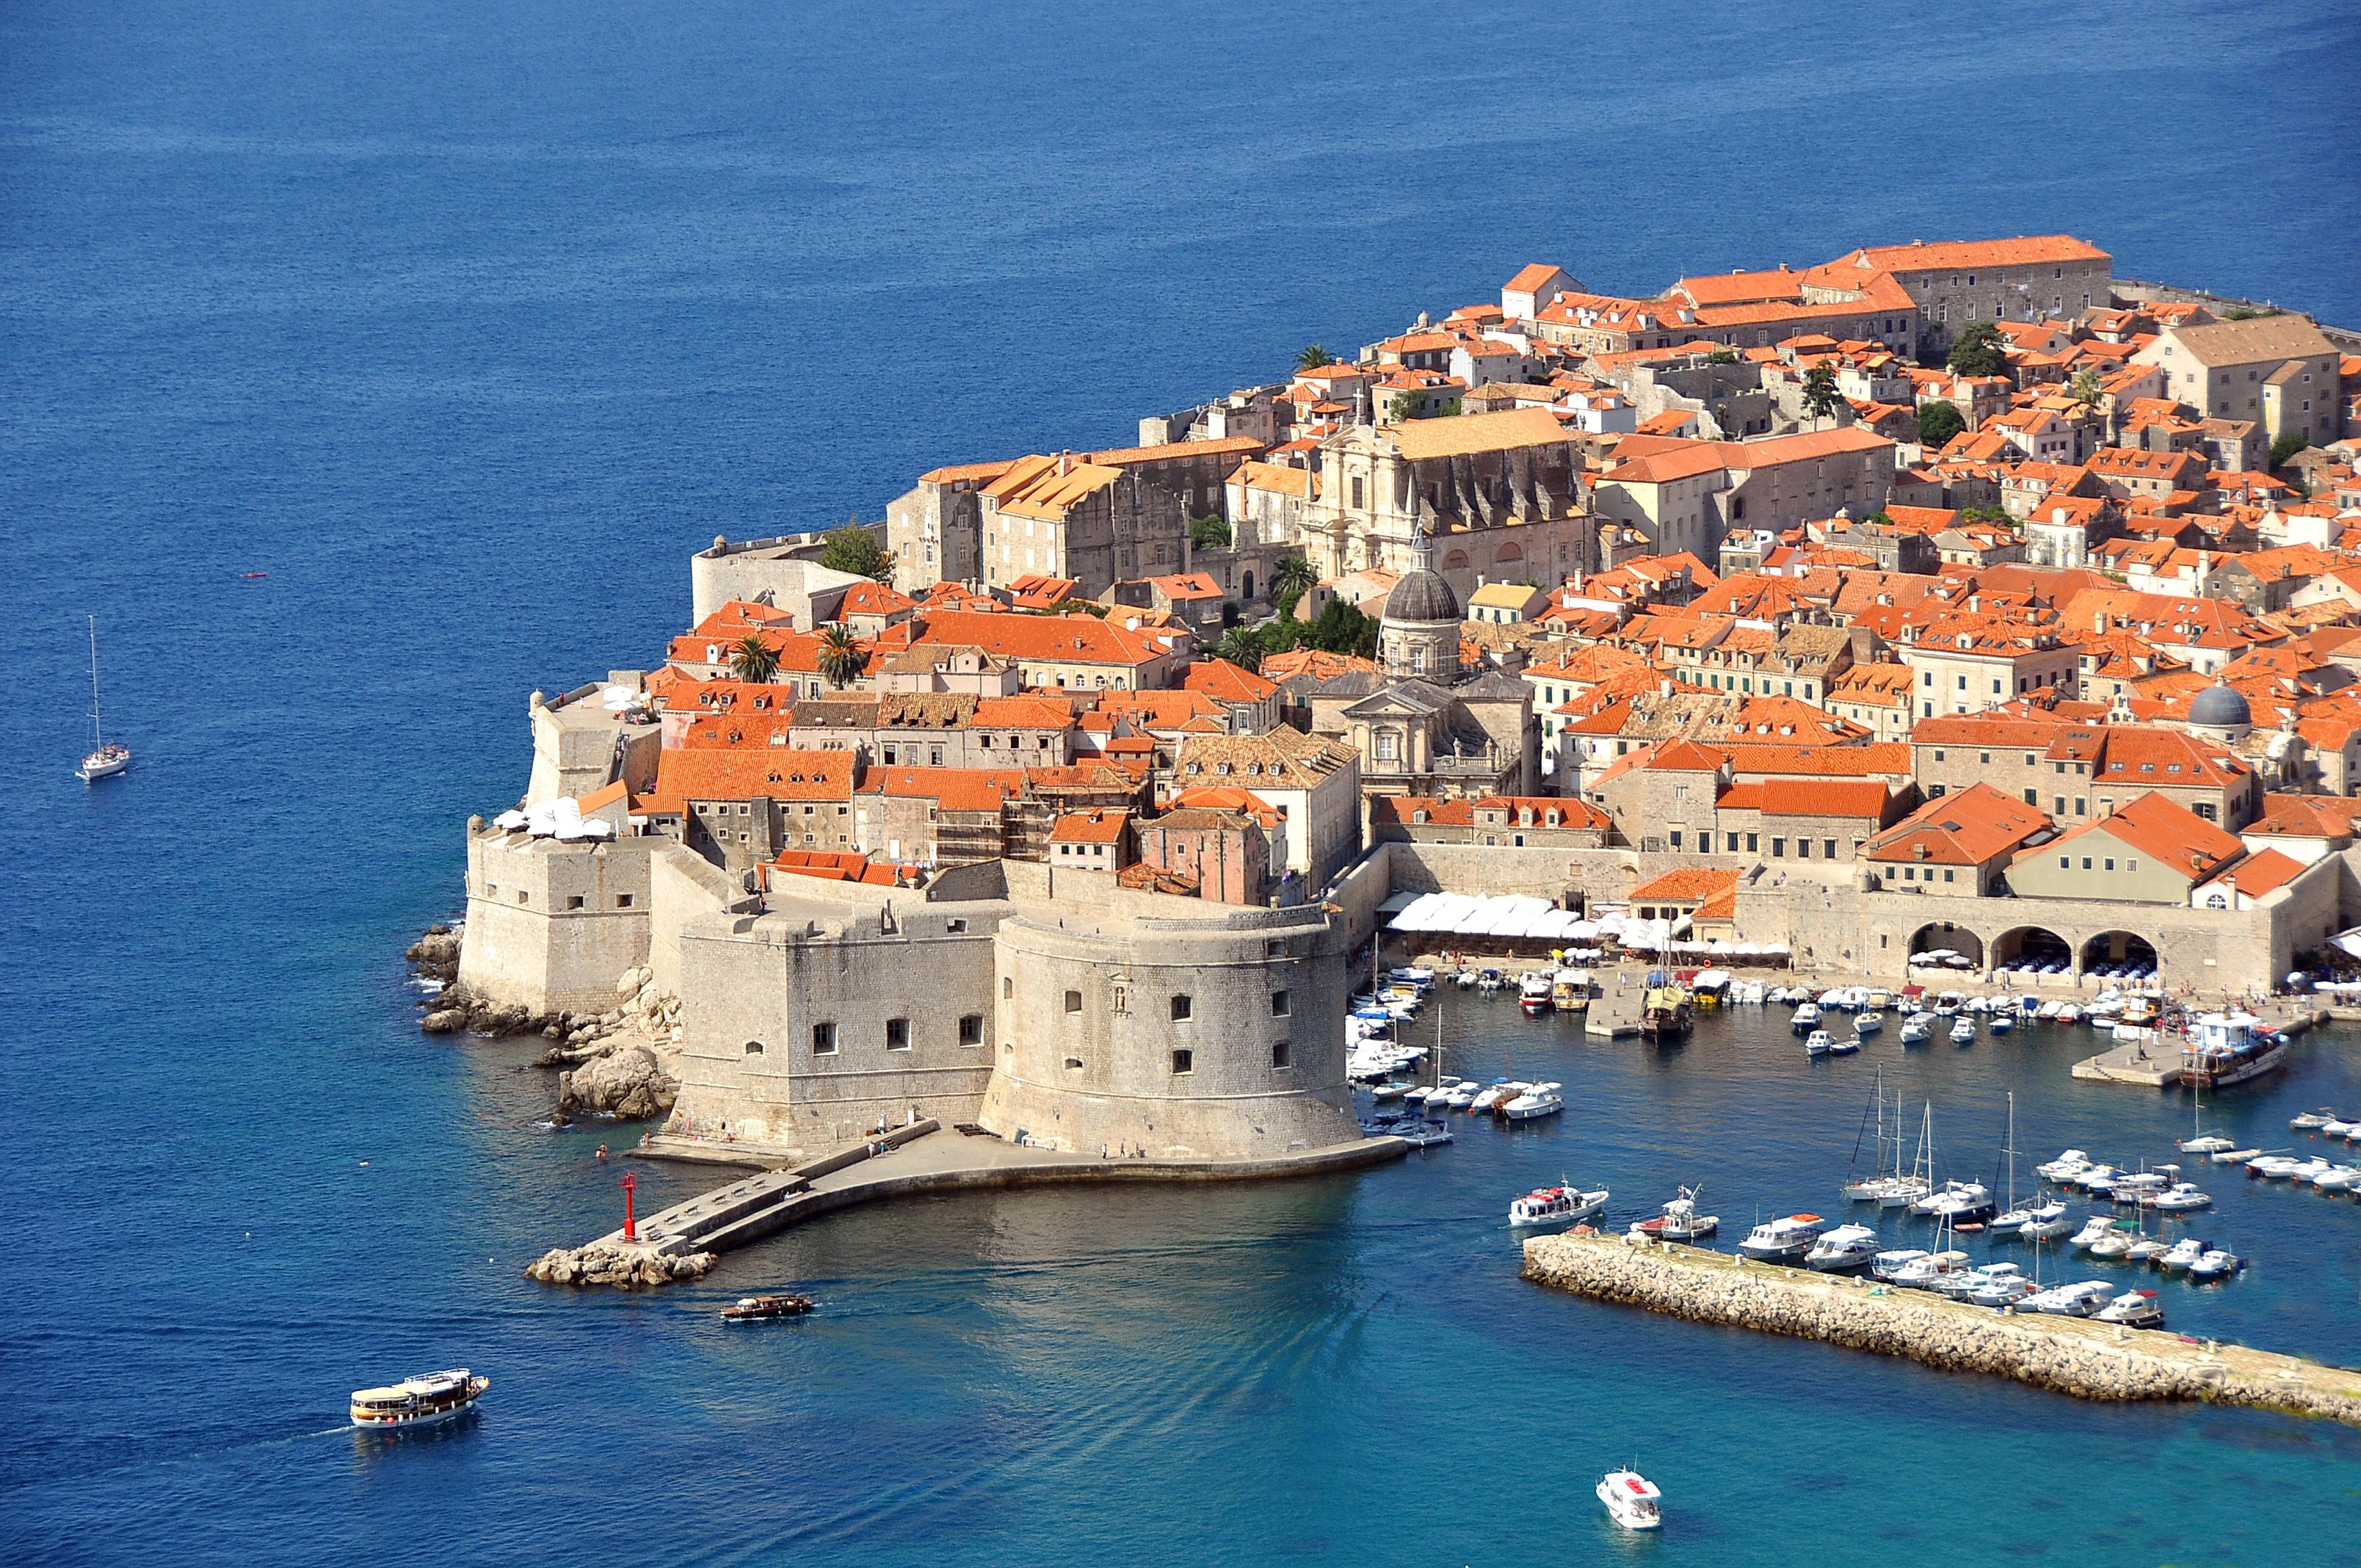 Croatia. Views of the city Dubrovnik